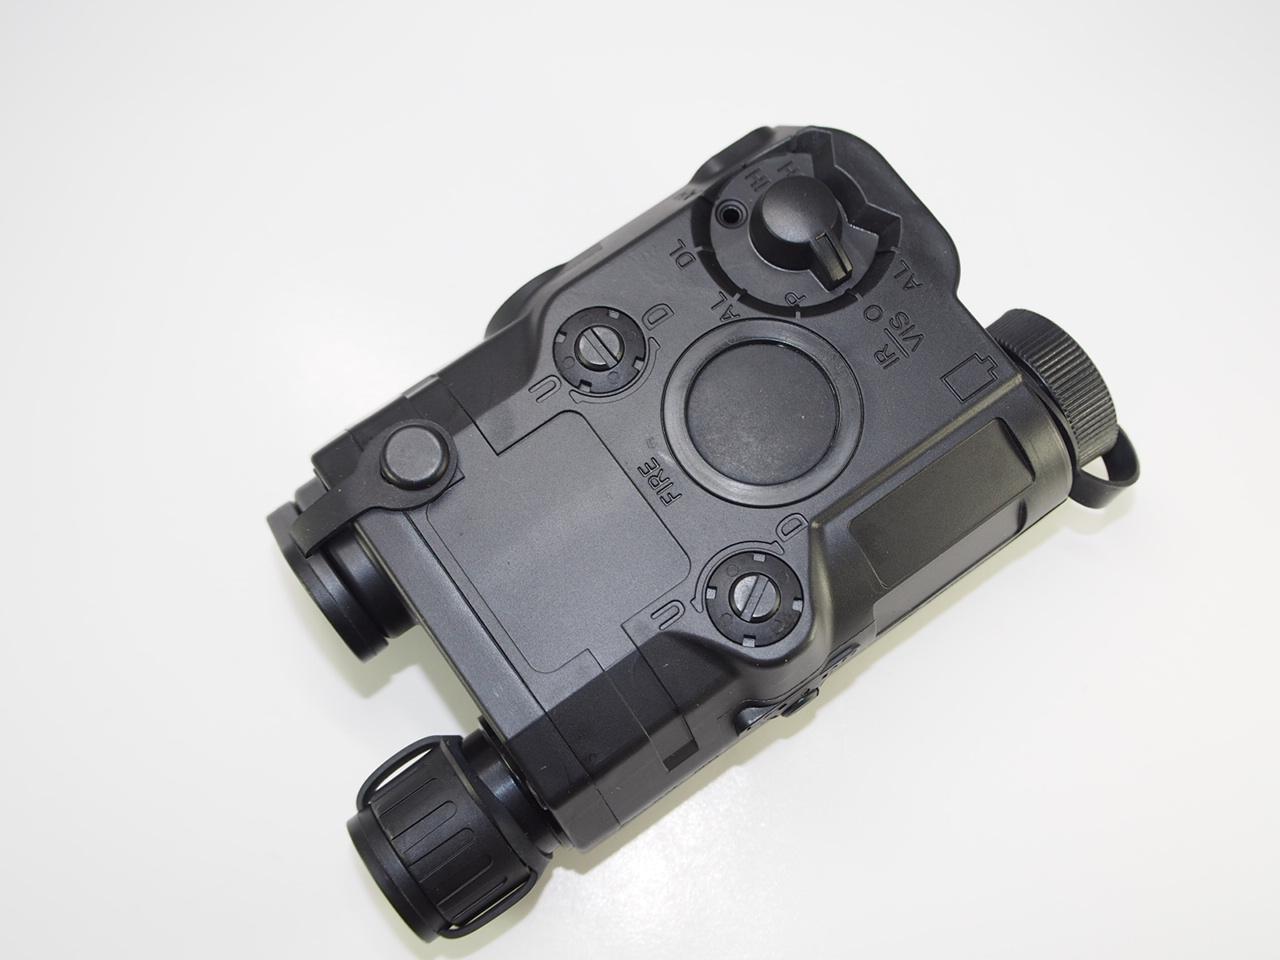 VFC PEQ-15型バッテリーケース (ケース単体) BK